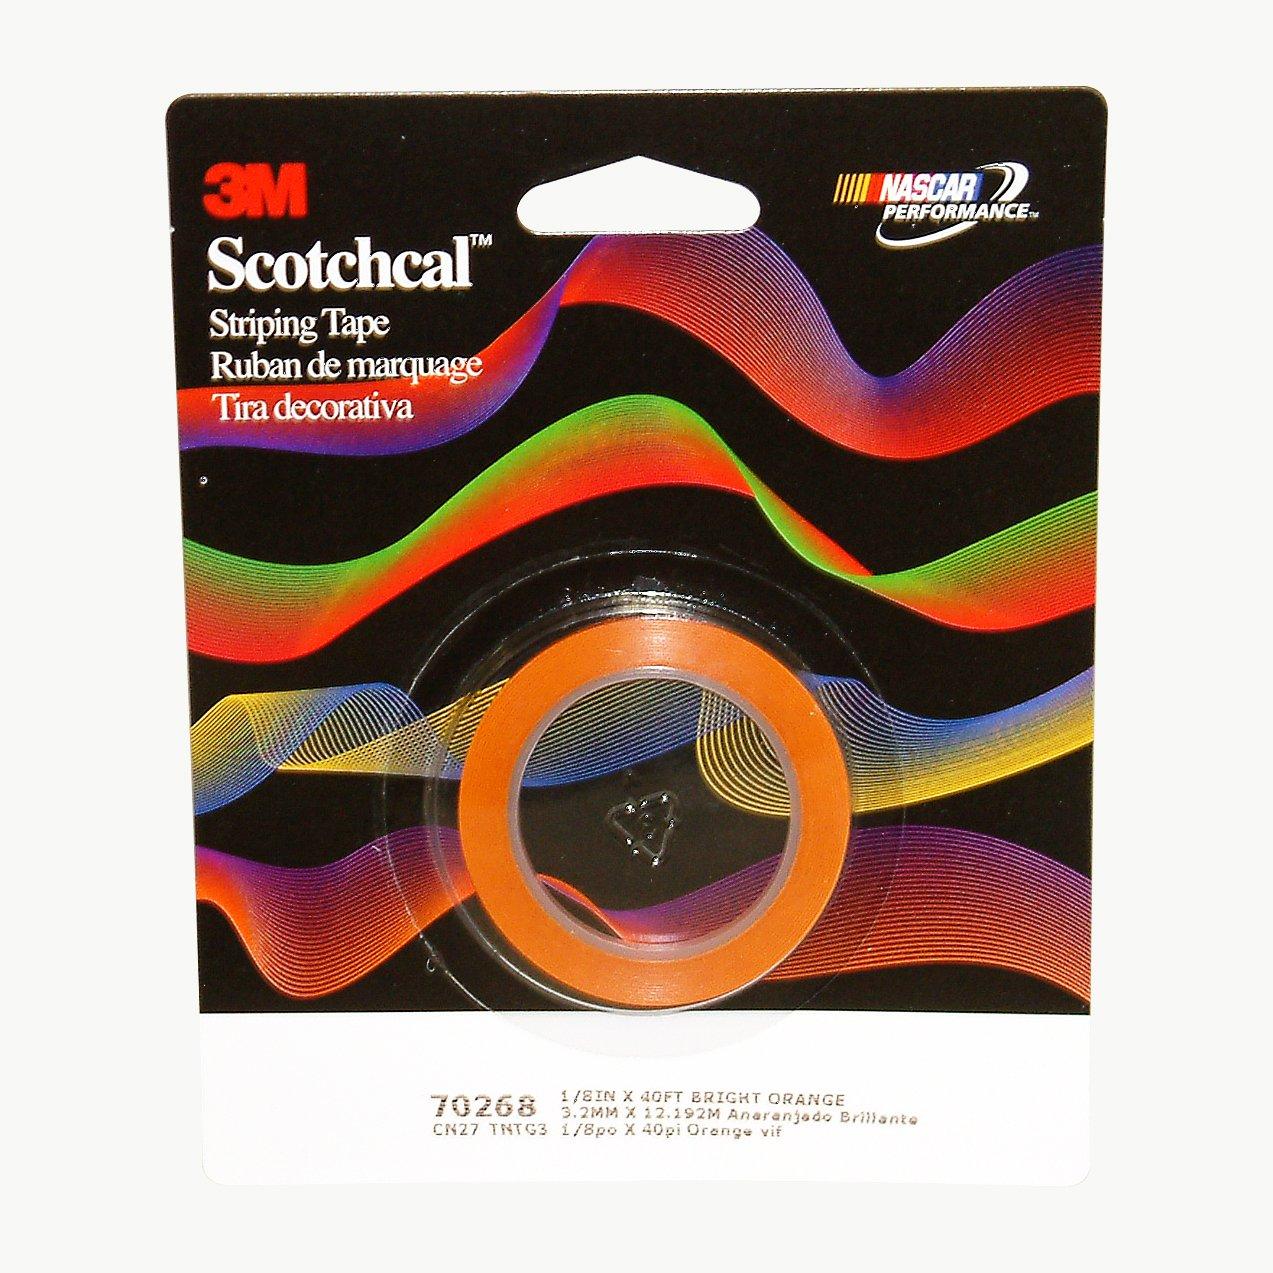 3M Scotch 75346887377 3M Scotch Scotchcal Striping Tape Silver Starfire 1//4 x 40